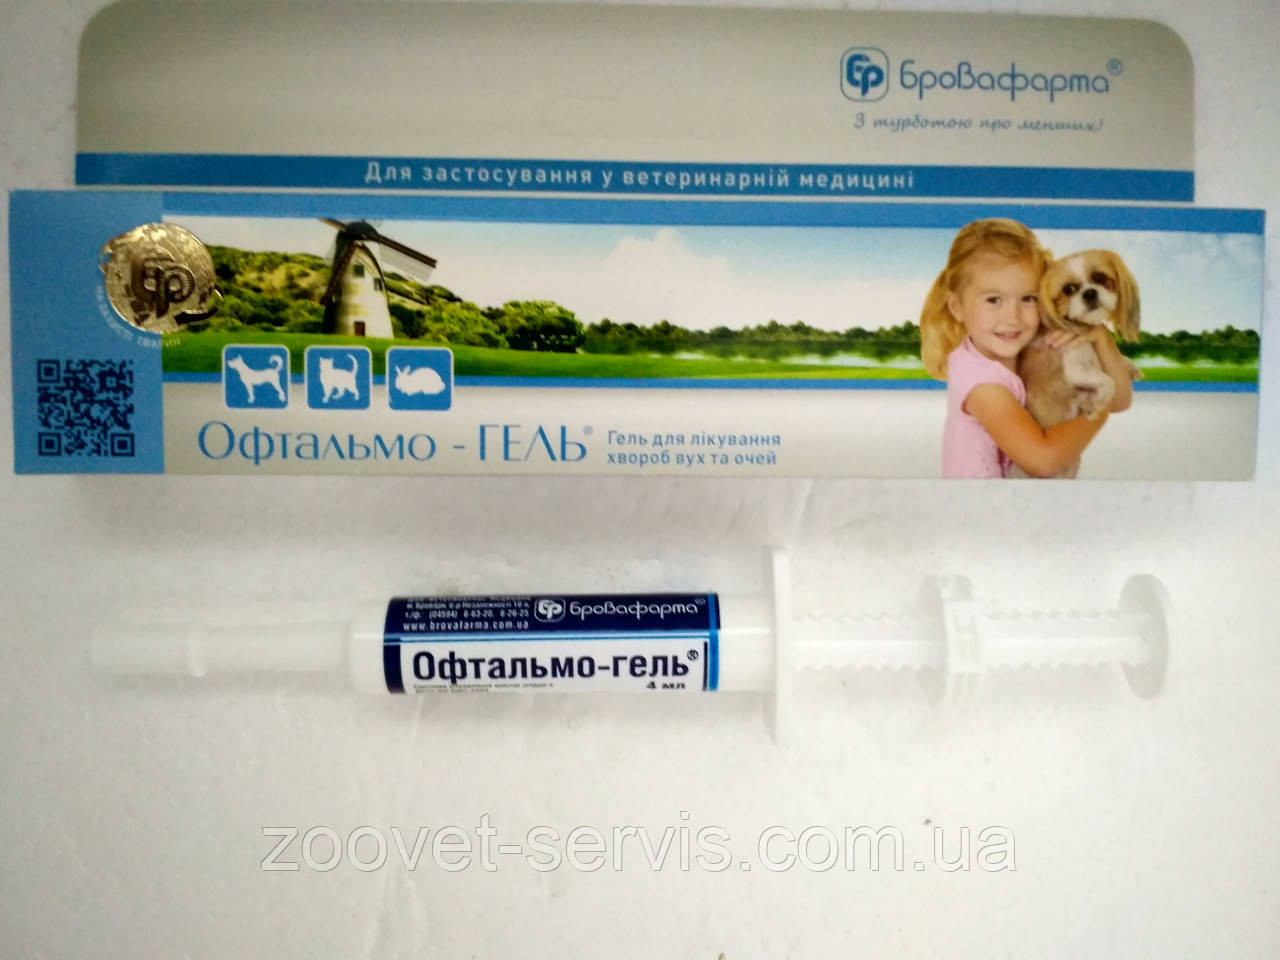 Офтальмо-гель, 4 мл